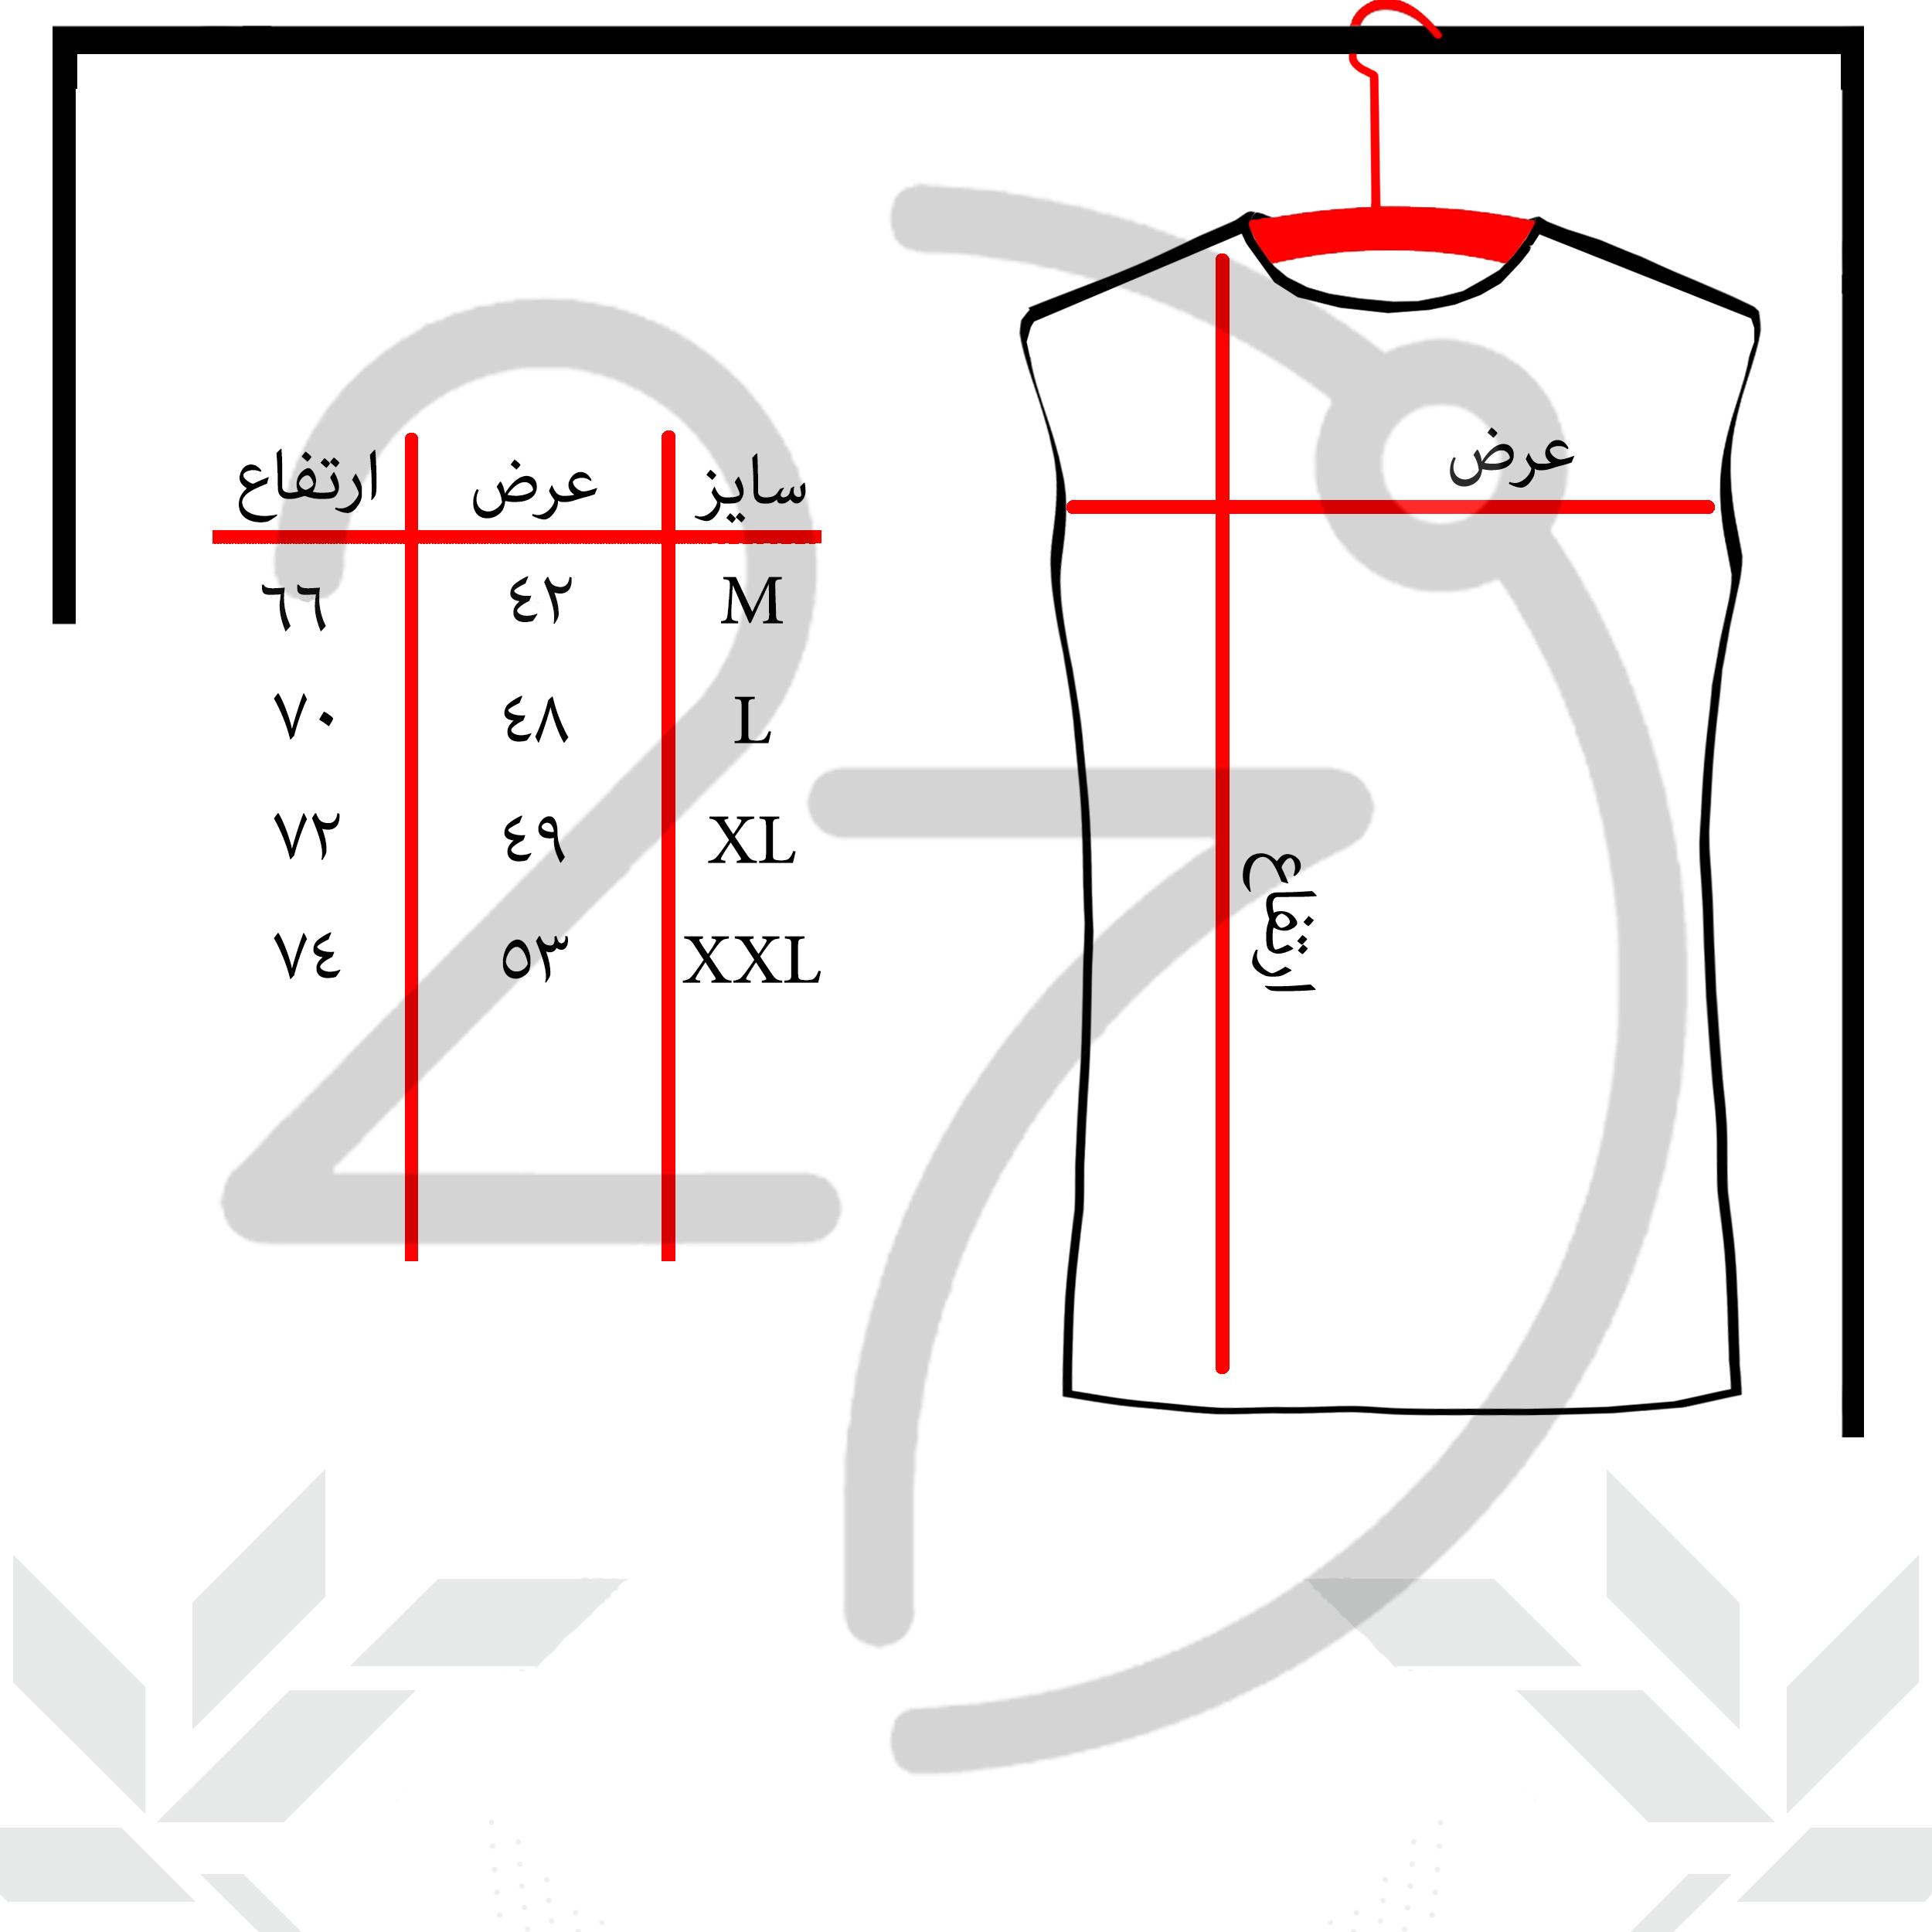 تاپ زنانه 27 طرح select stay stylish کد AL14 -  - 4